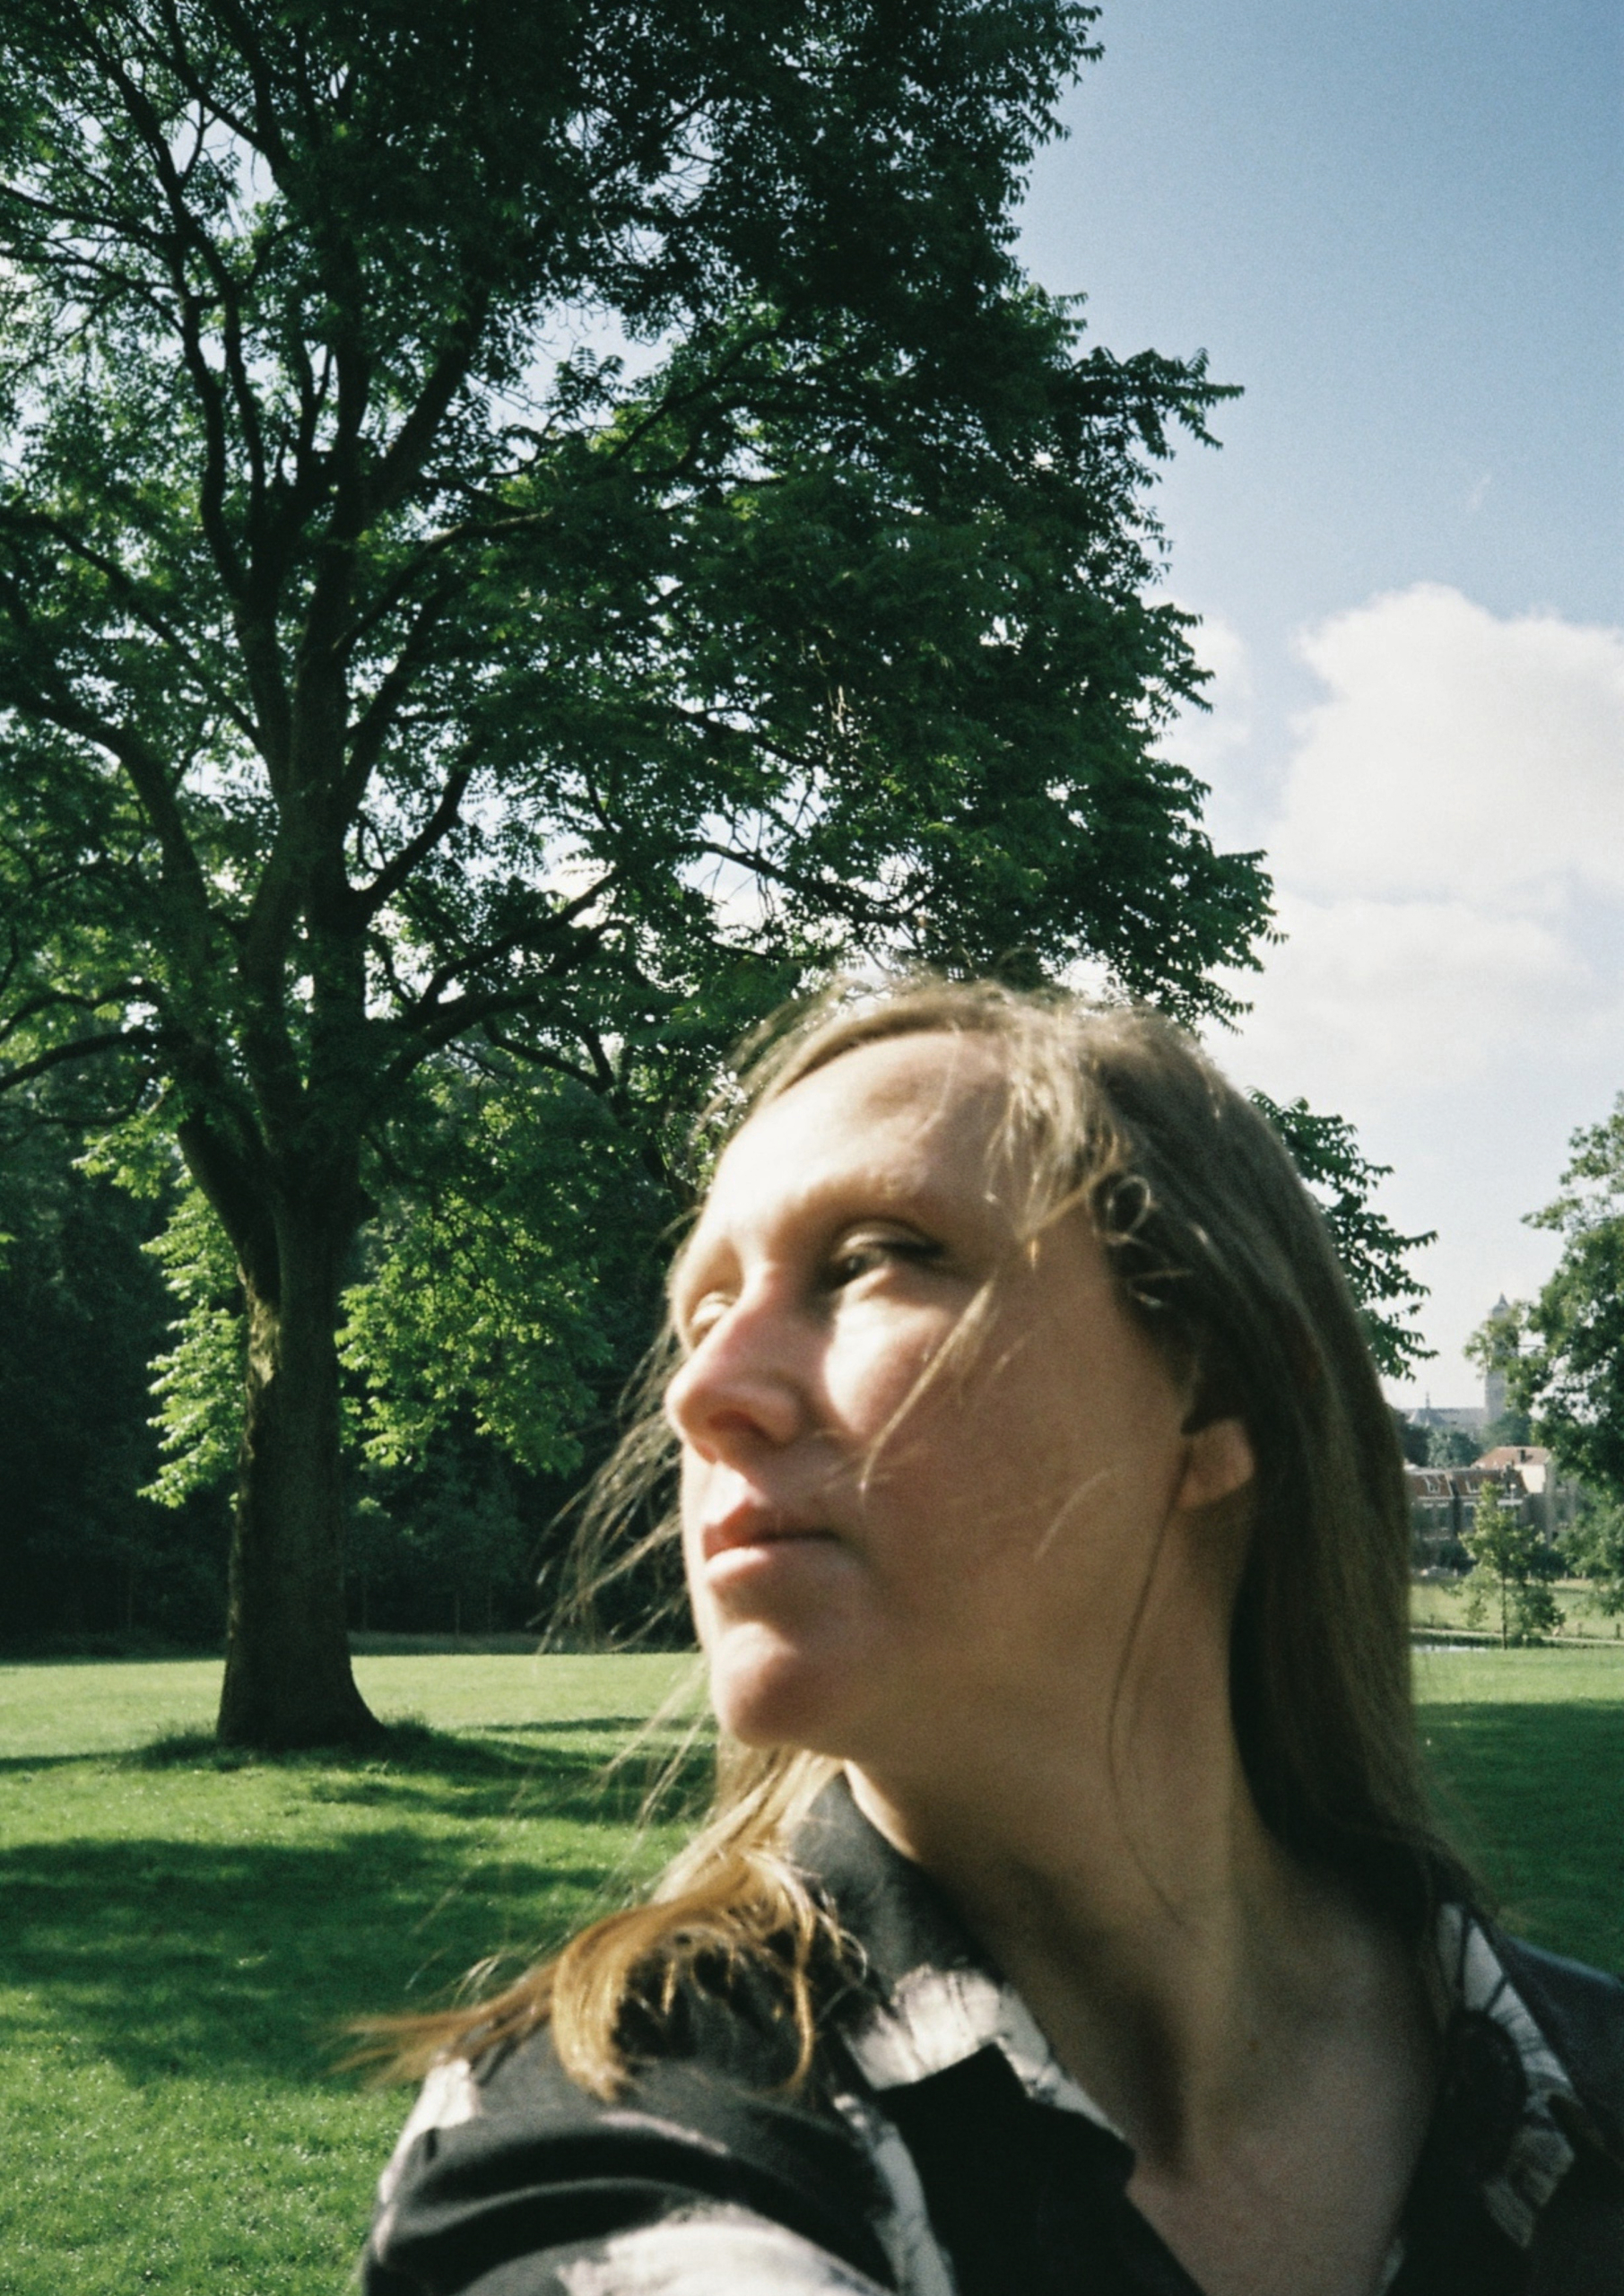 Lique Schoot, Self-portrait 20 06 20